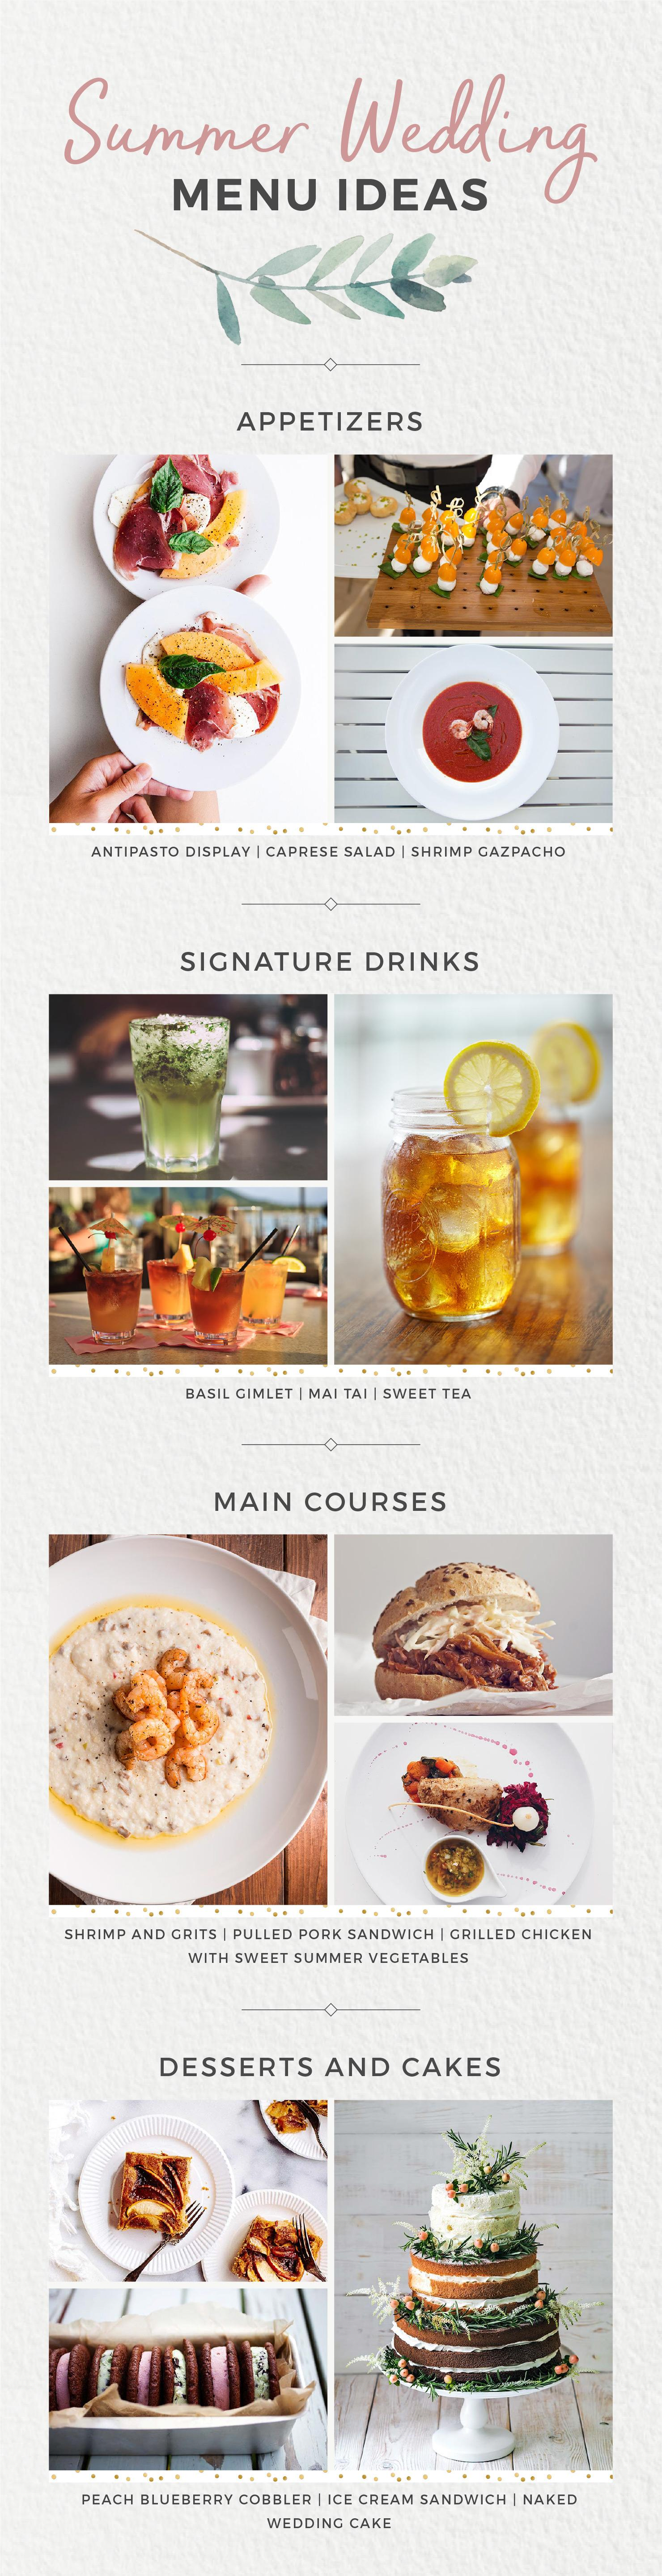 Wedding Menu Ideas for Every Season Summer Wedding Food Shutterfly Philly In Love Philadelphia Weddings